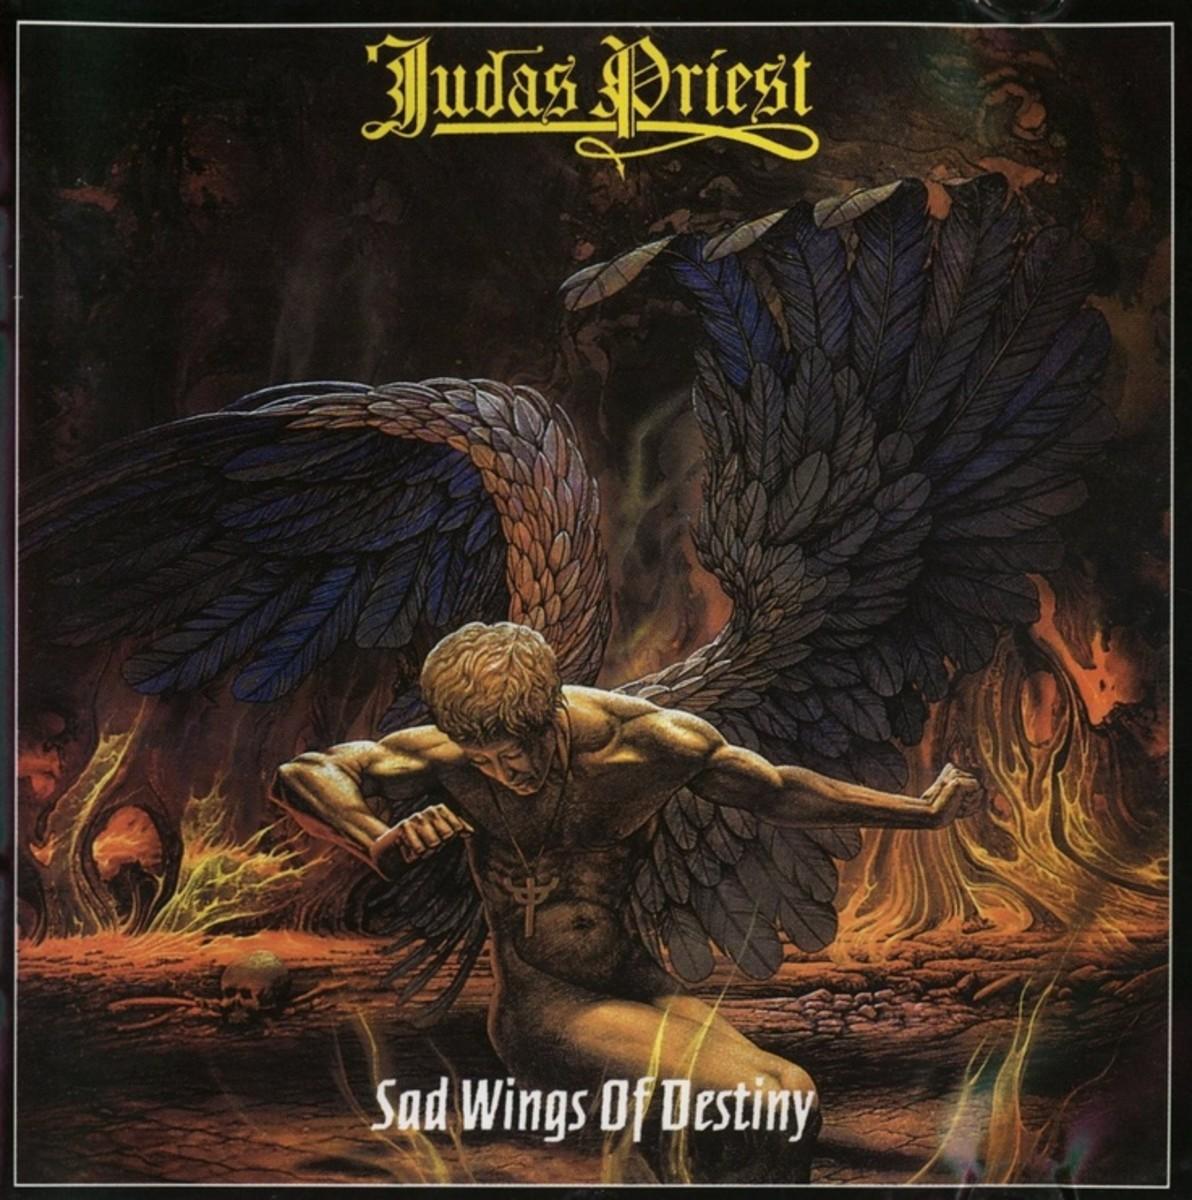 Judas Priest album cover.